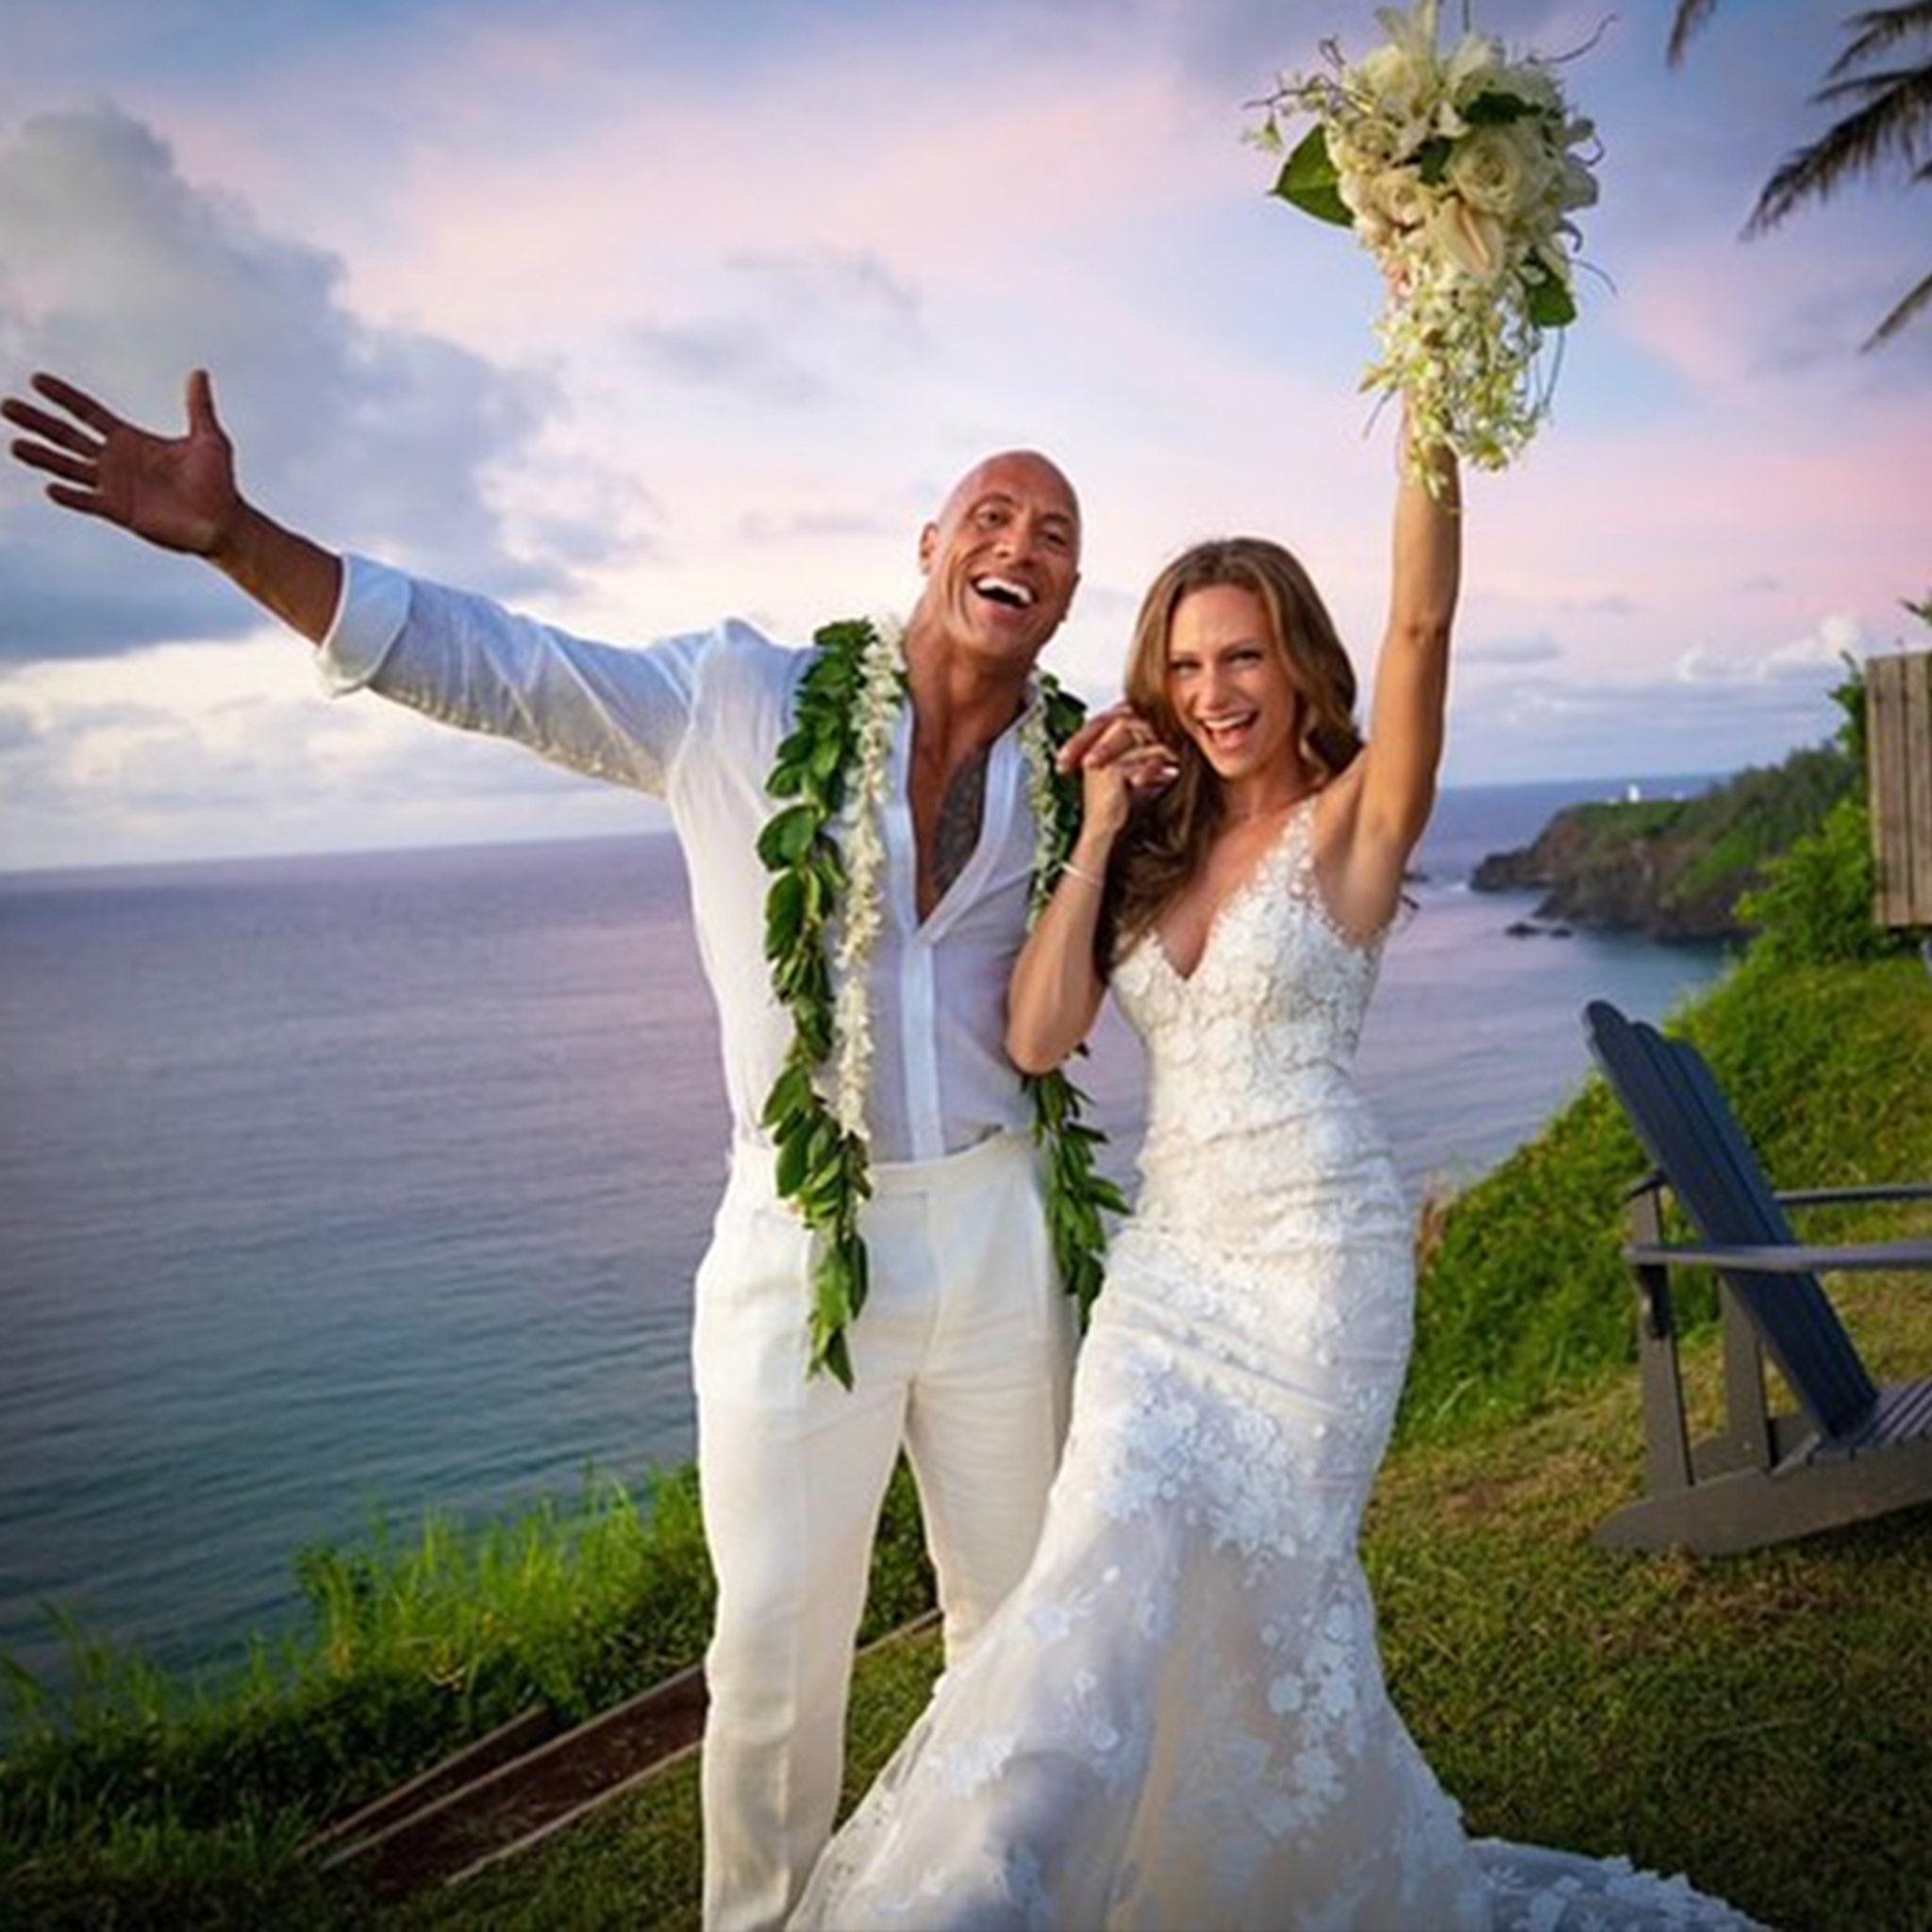 Dwayne 'The Rock' Johnson Marries Longtime GF Lauren Hashian